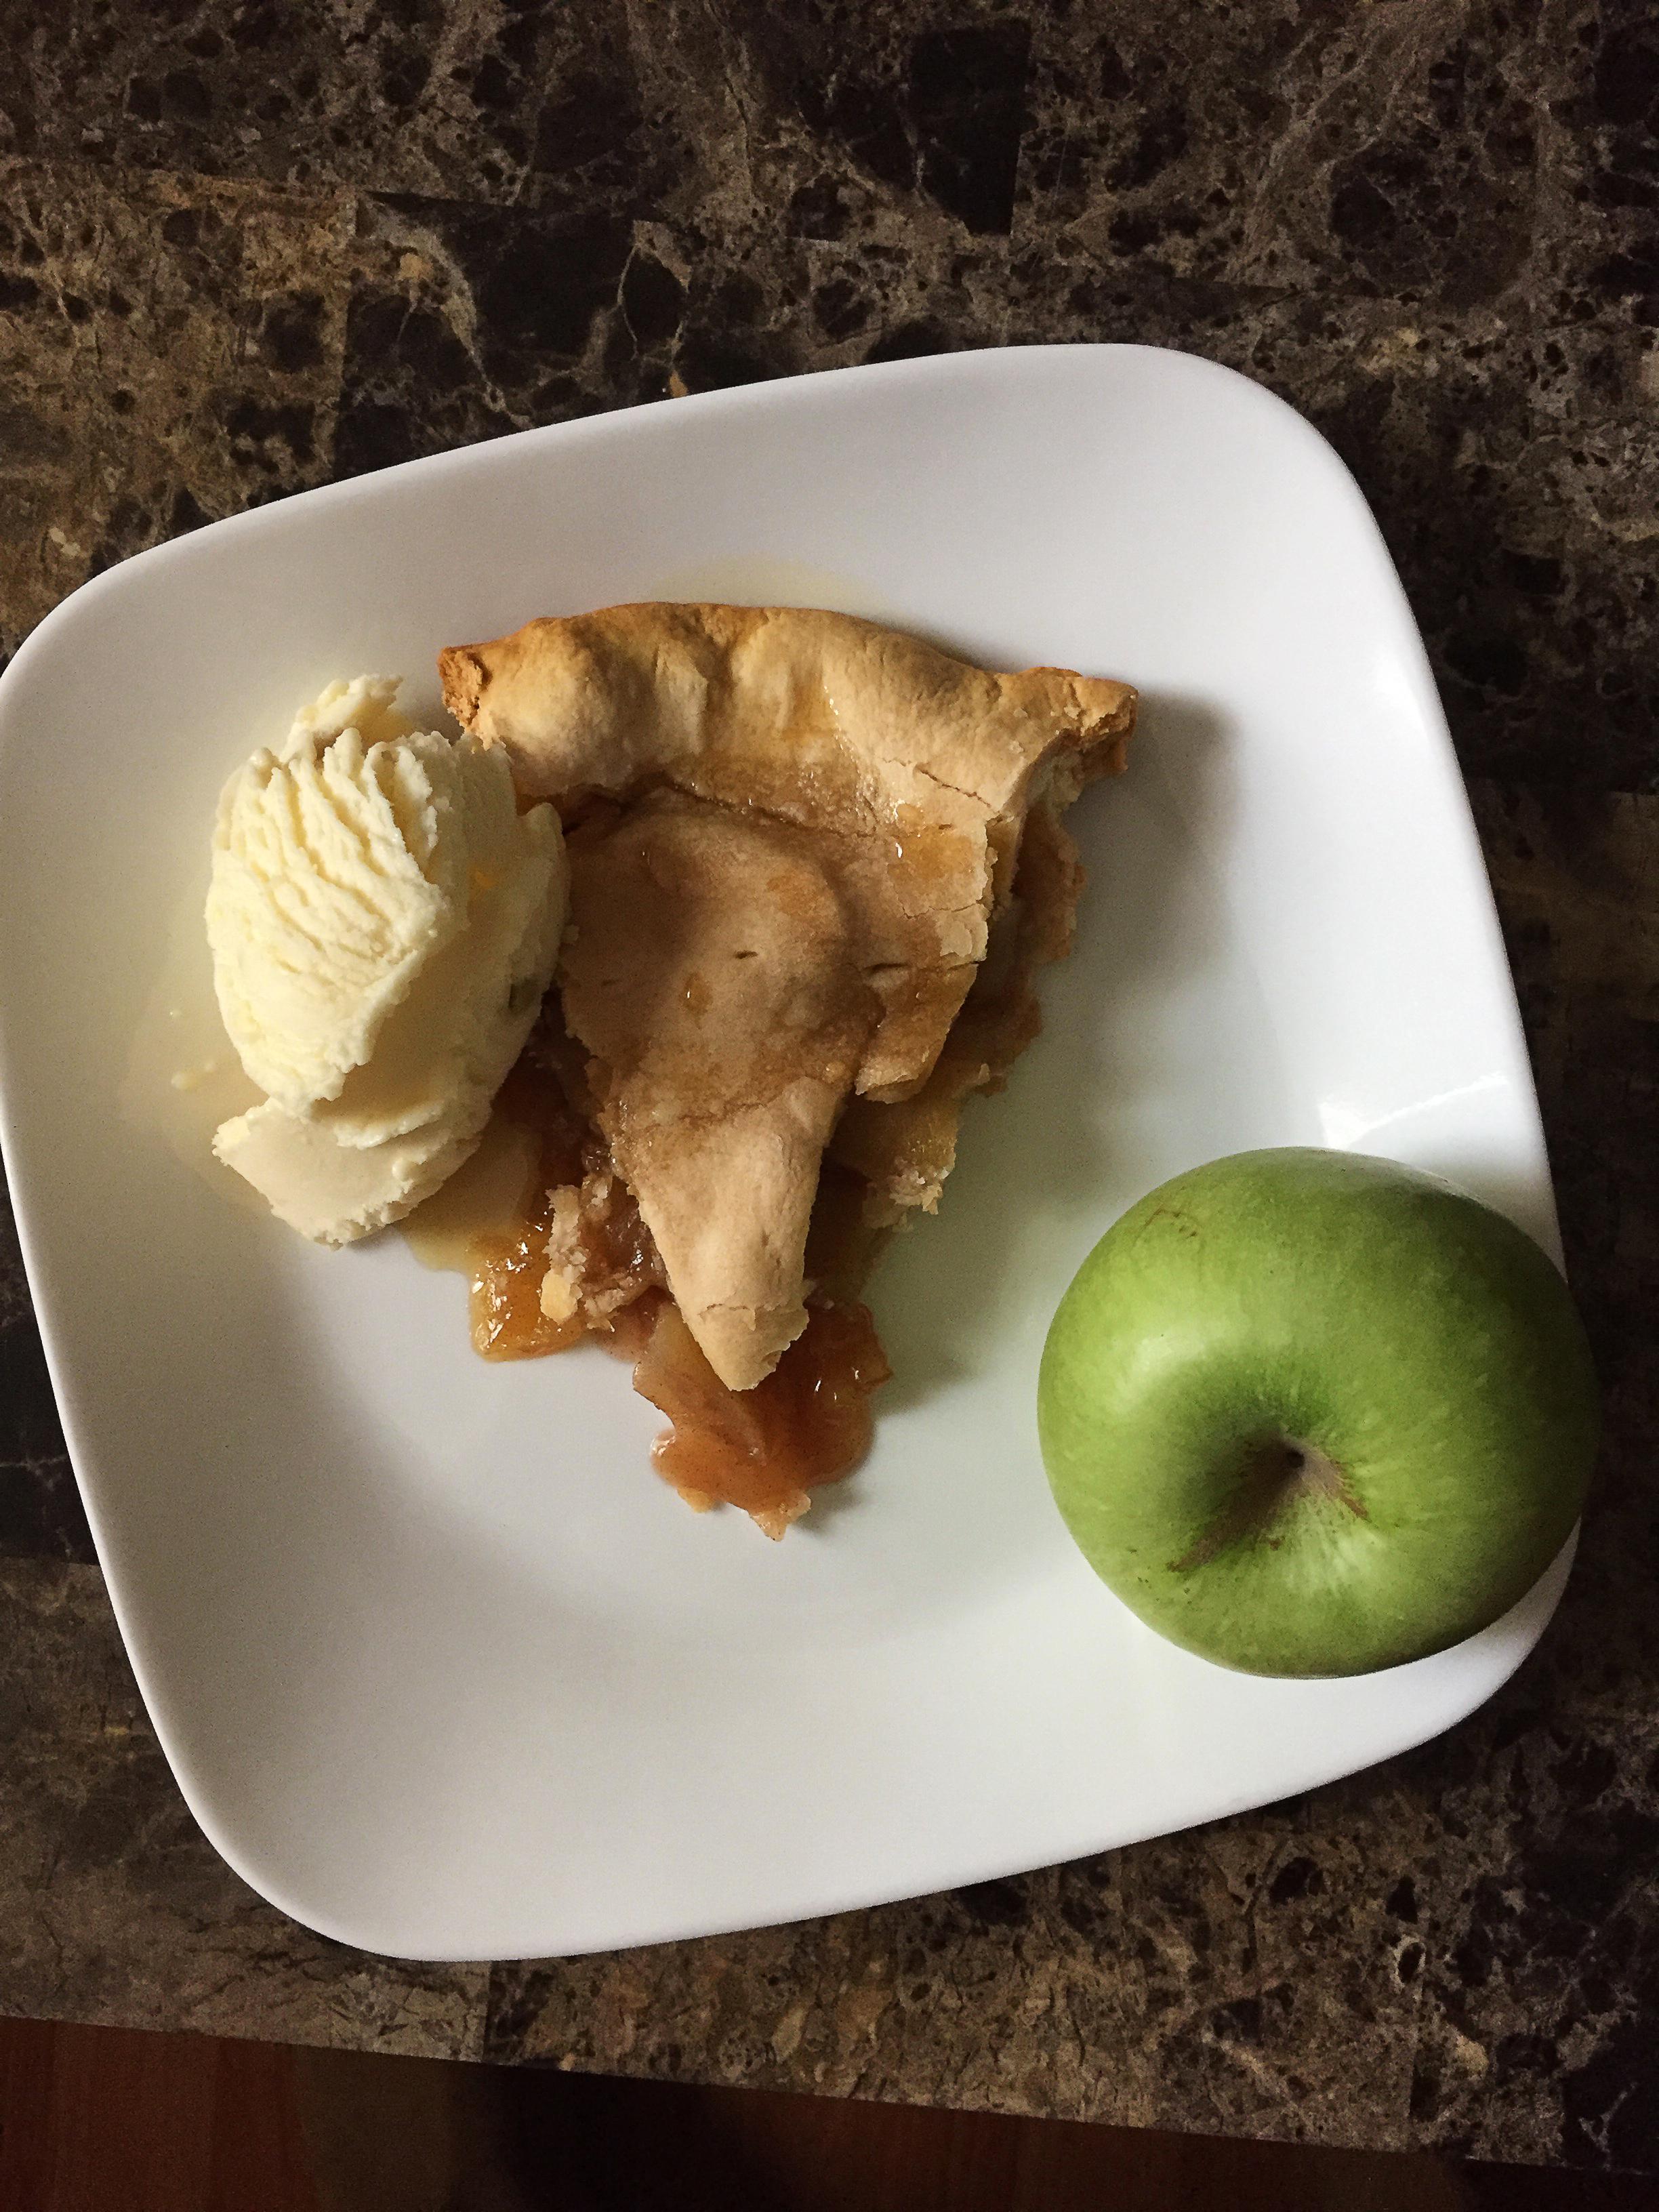 Joanna Gaines' Apple Pie